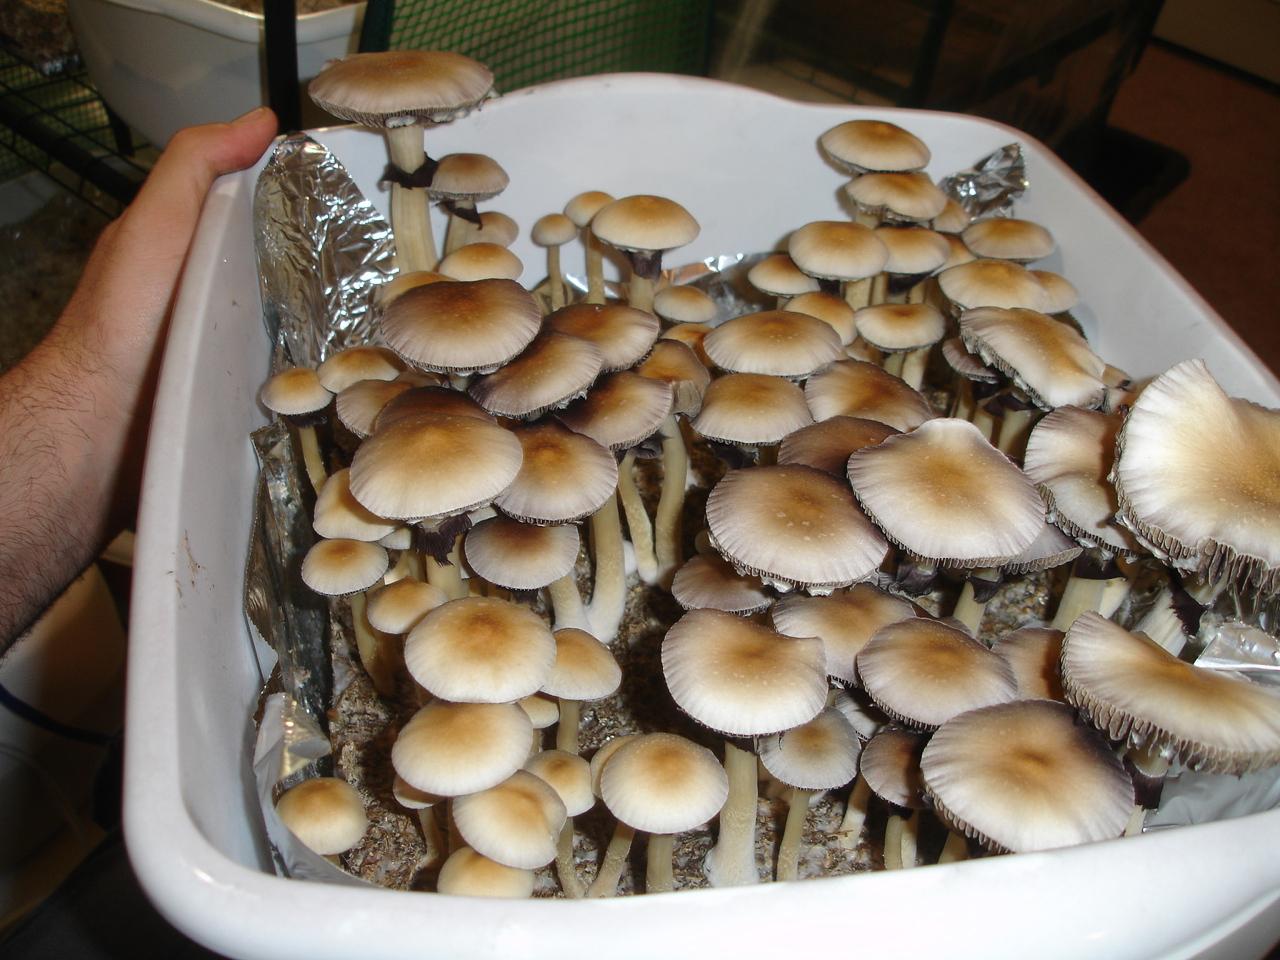 Greenhouse humidity FAE Pinning Mushroom Cultivation Shroomery  #906D3B